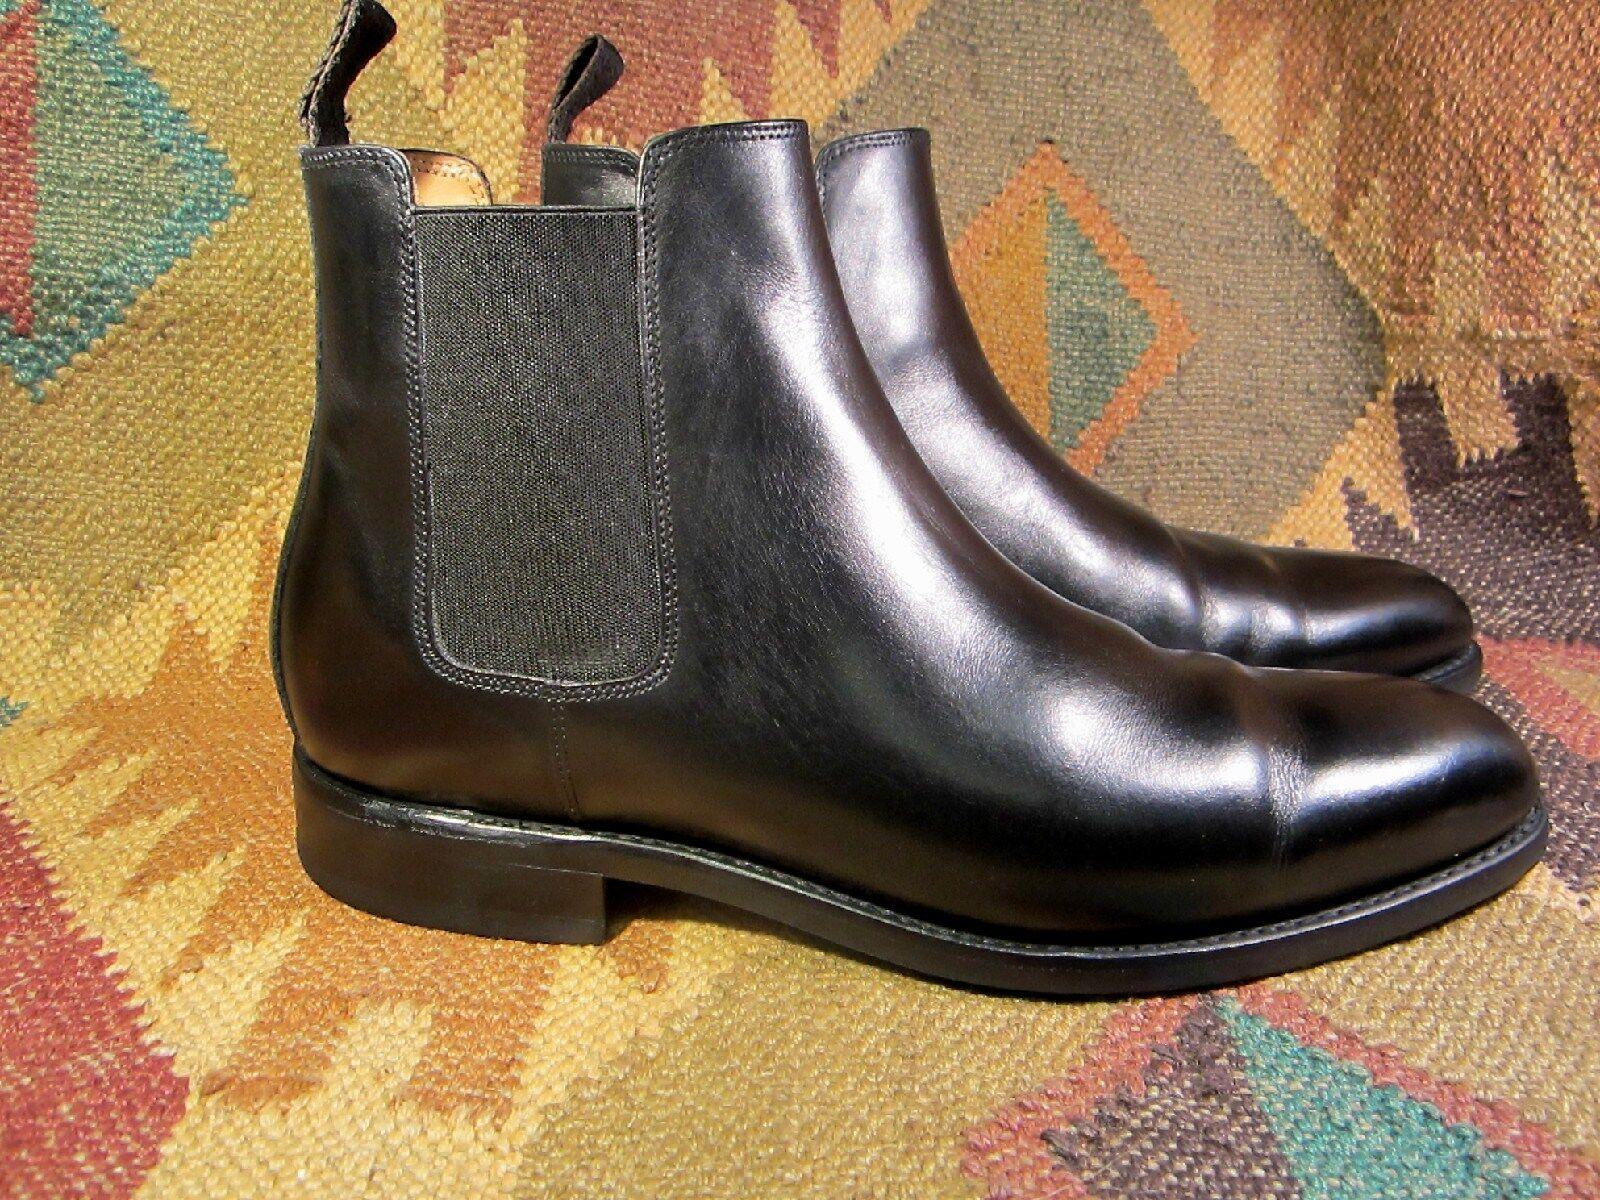 LODING noir Bottine Chelsea en cuir Taille 8 made in France